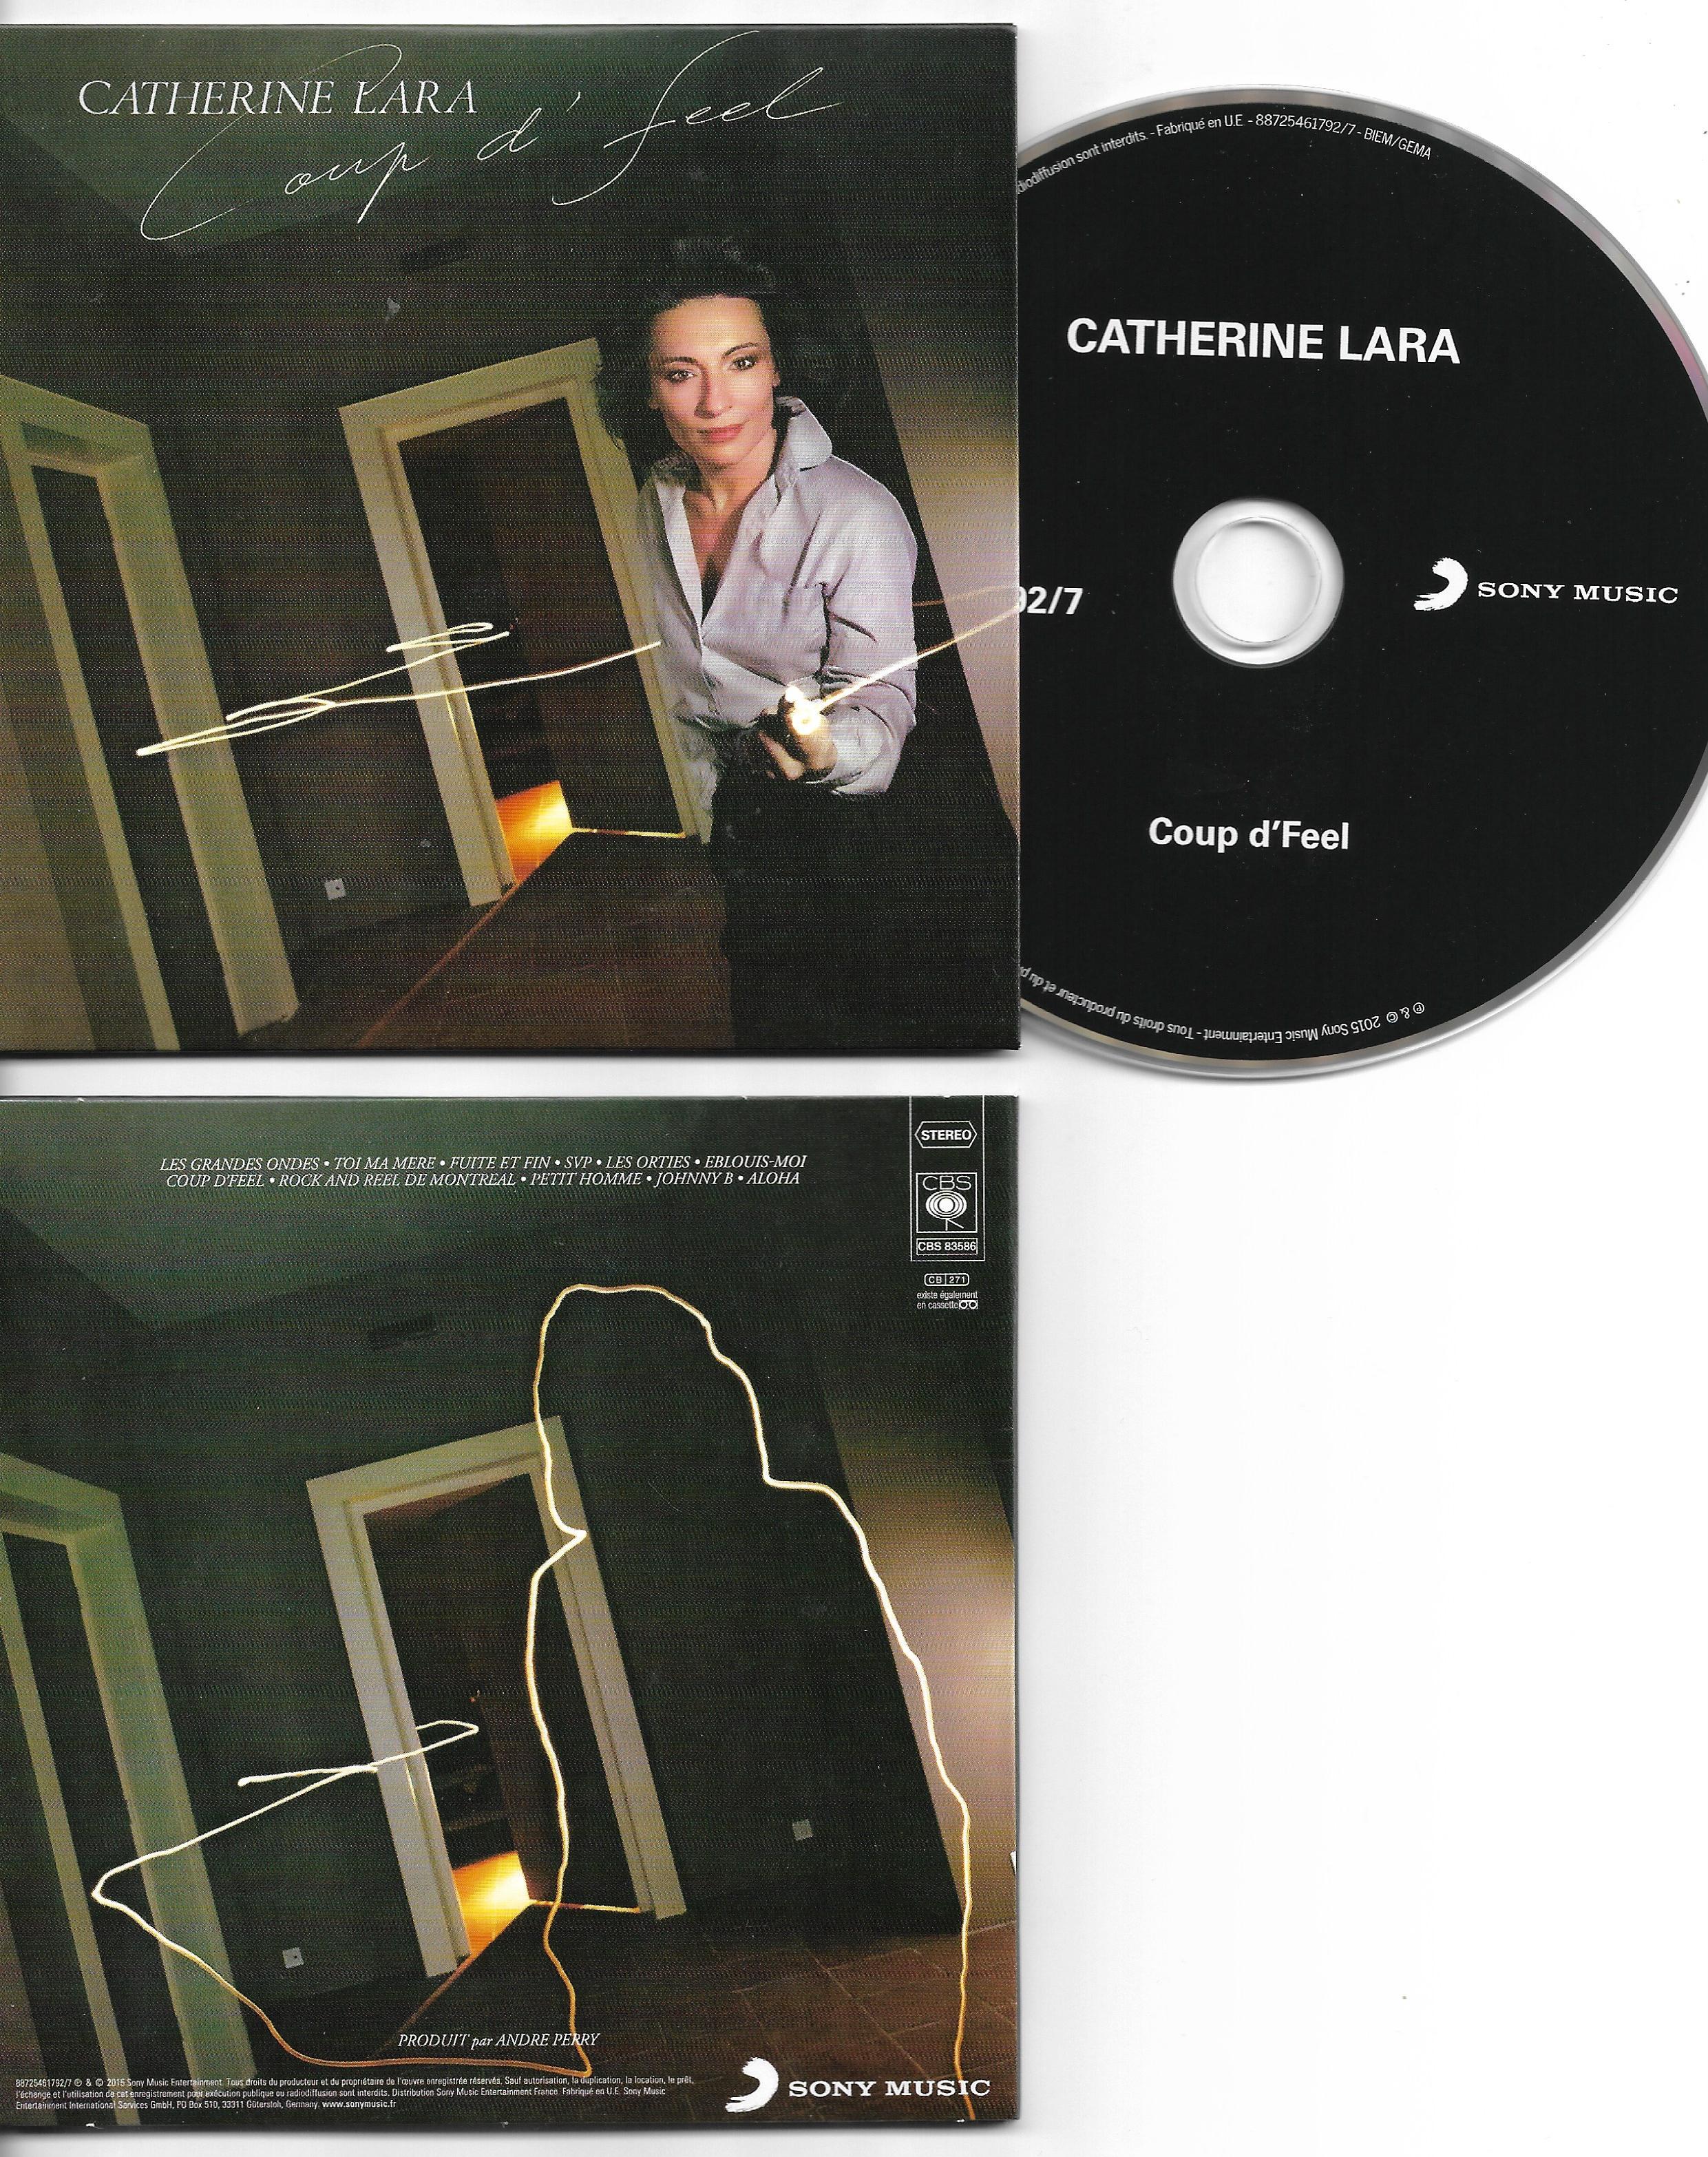 CATHERINE LARA - Coup d'feel - MINI LP REPLICA - 11-TRACK CARD SLEEVE - Pochette Cartonnée - CD